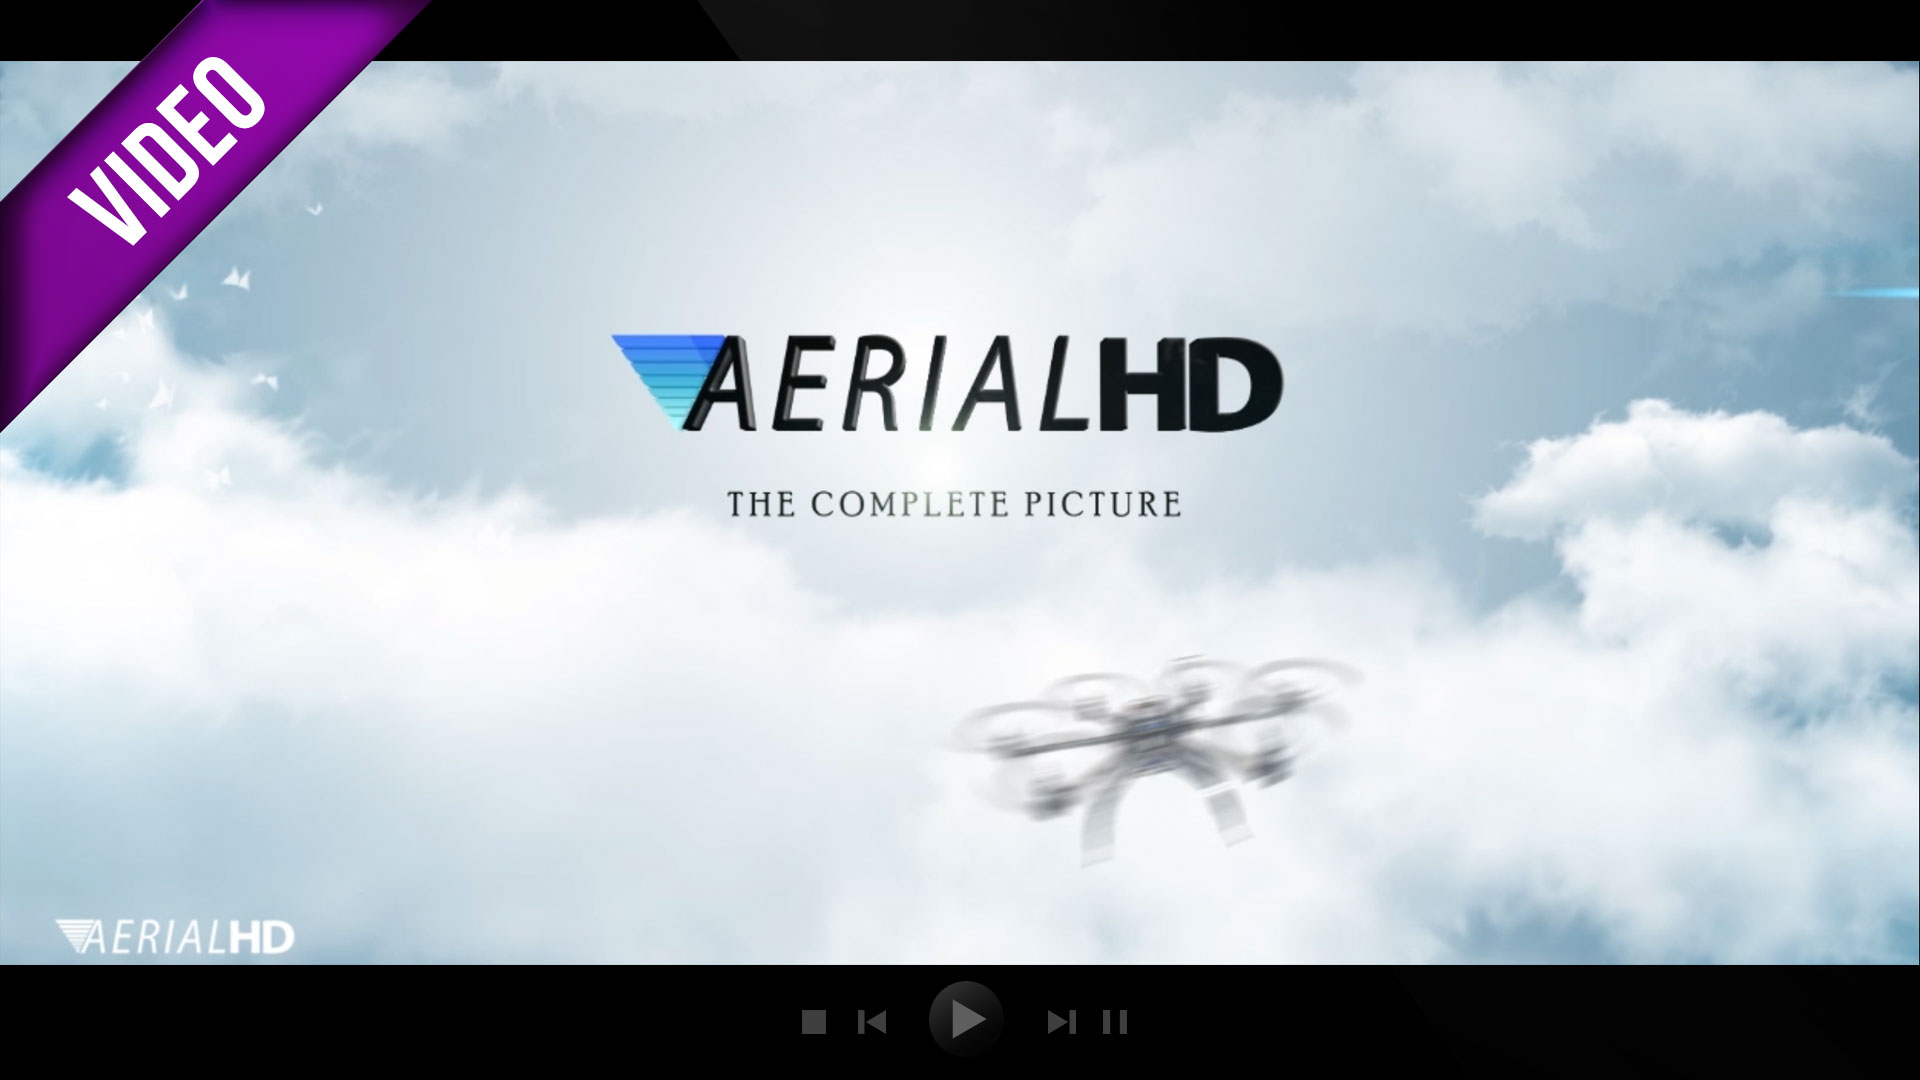 Logo-Sting-Aerial-HD